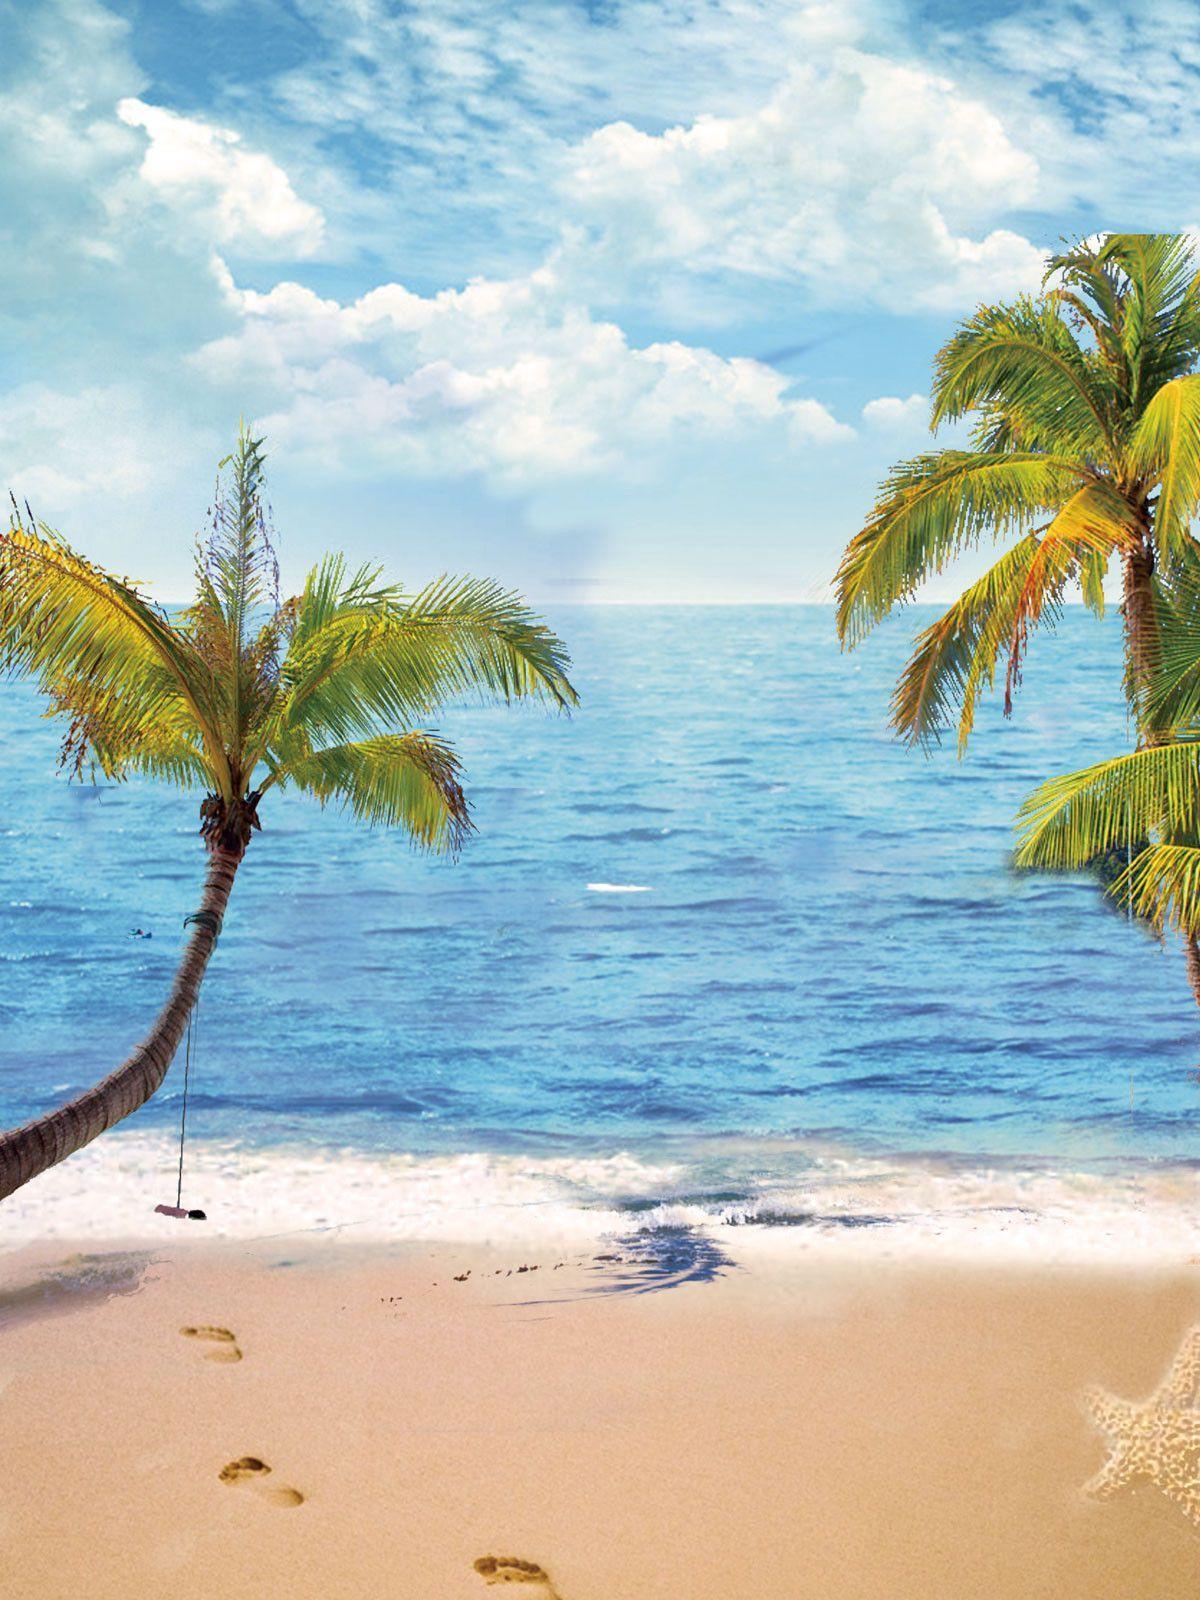 Beach Backdrop Ocean Backgrounds Blue Sky Backdrop G-491